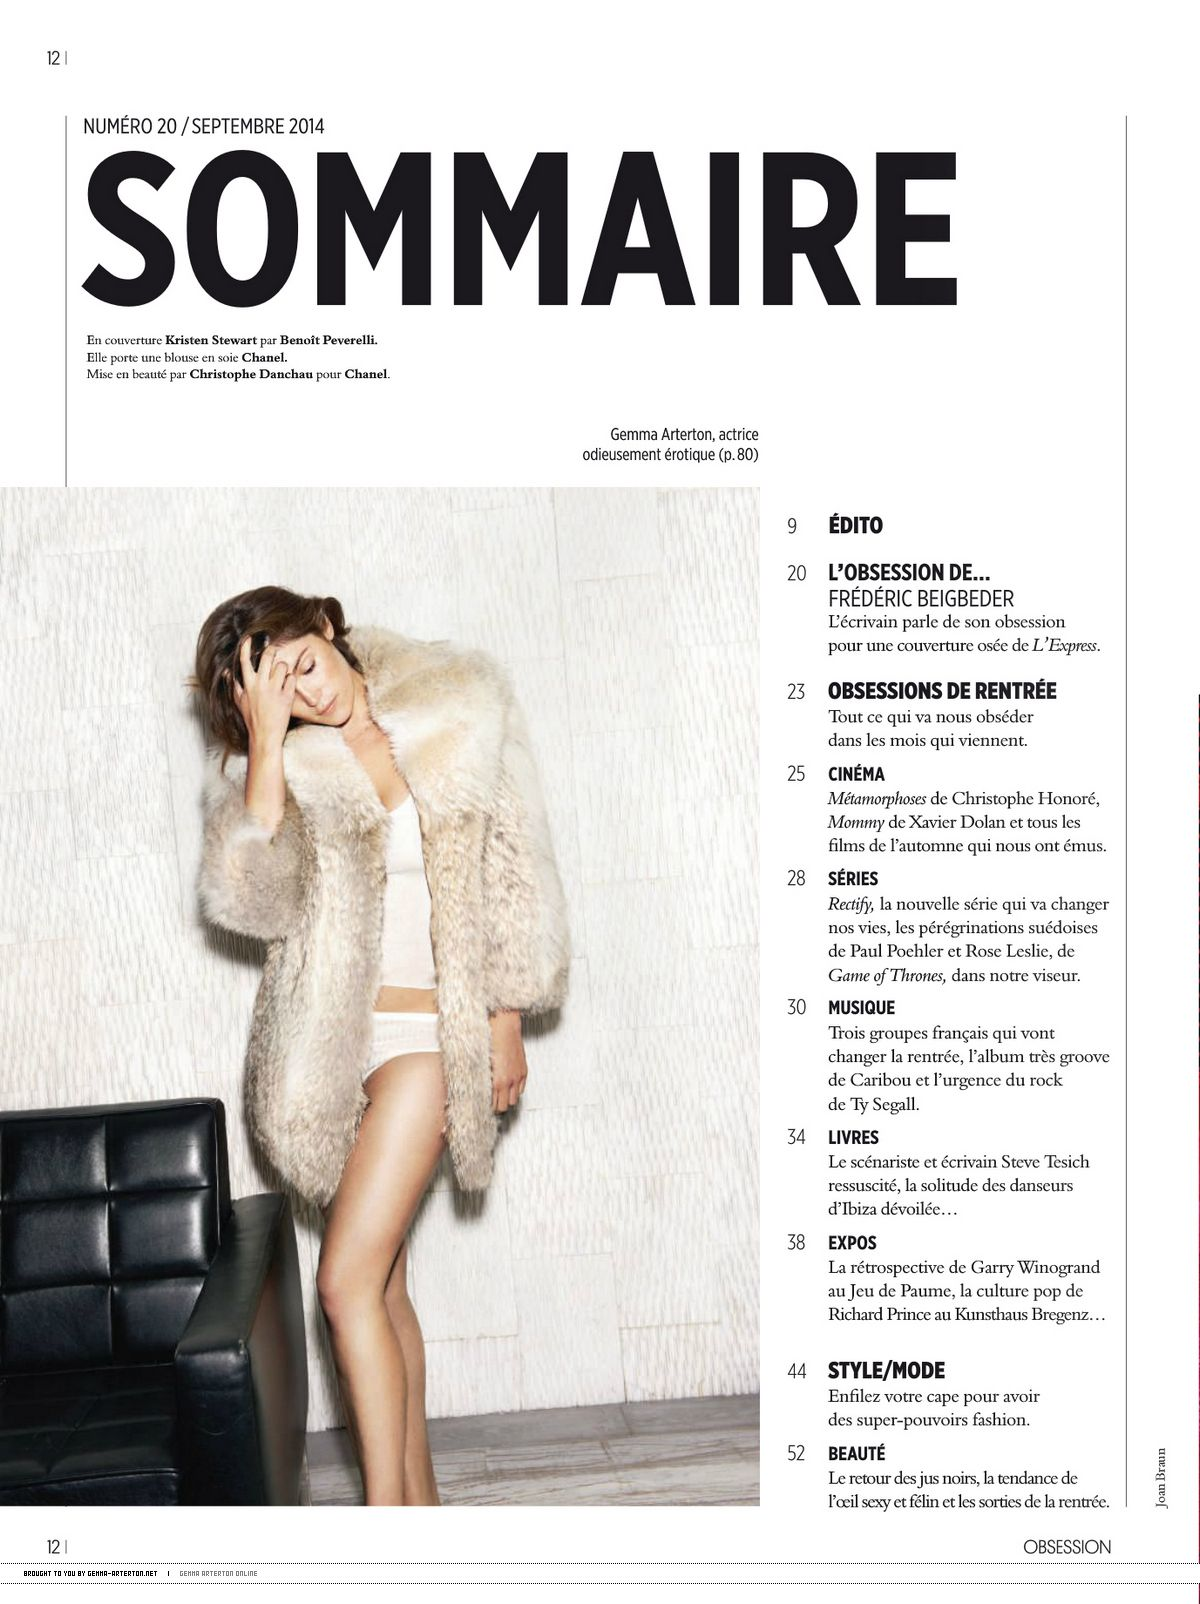 GEMMA ARERTON in Obsession Magazine, September 2014 Issue